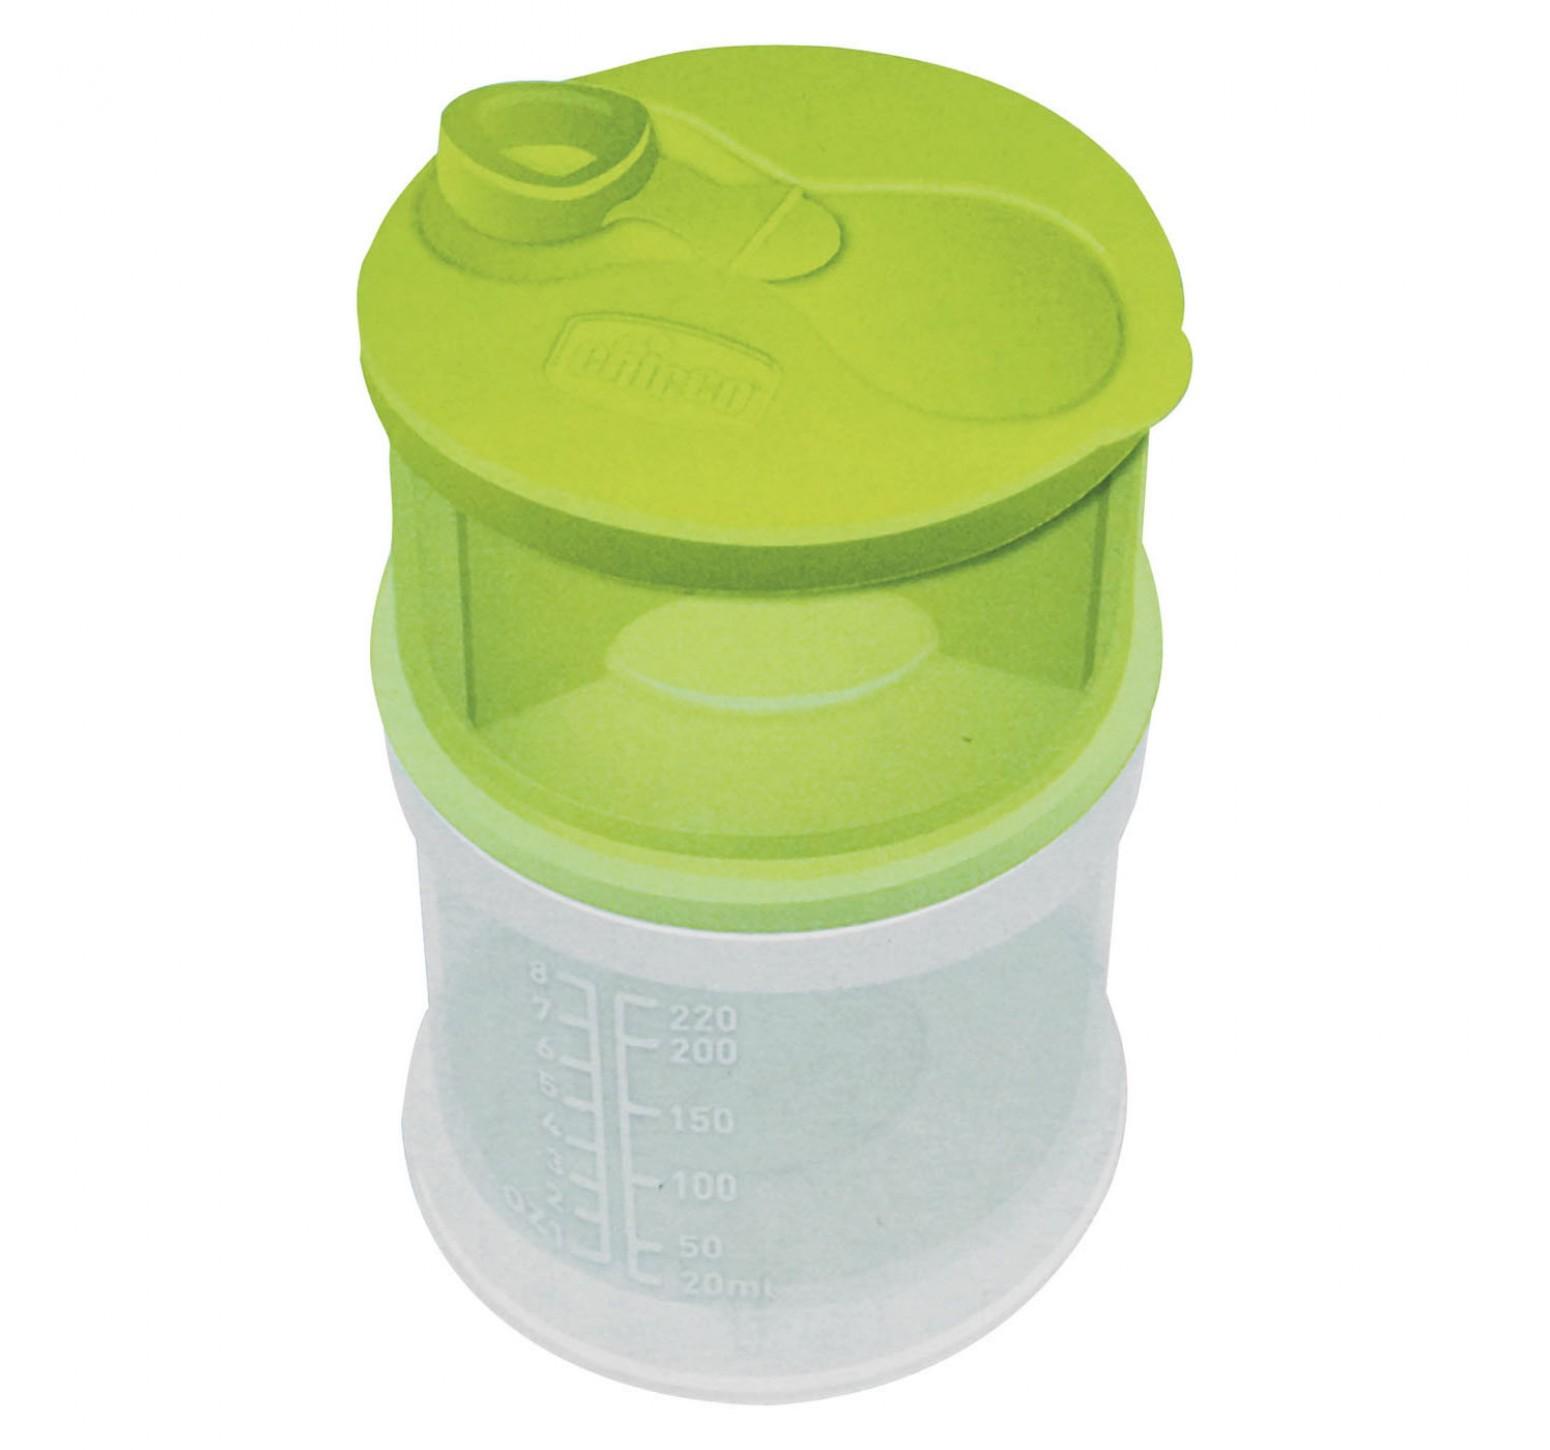 Chicco Dosificador de leche en polvo (3 fases)